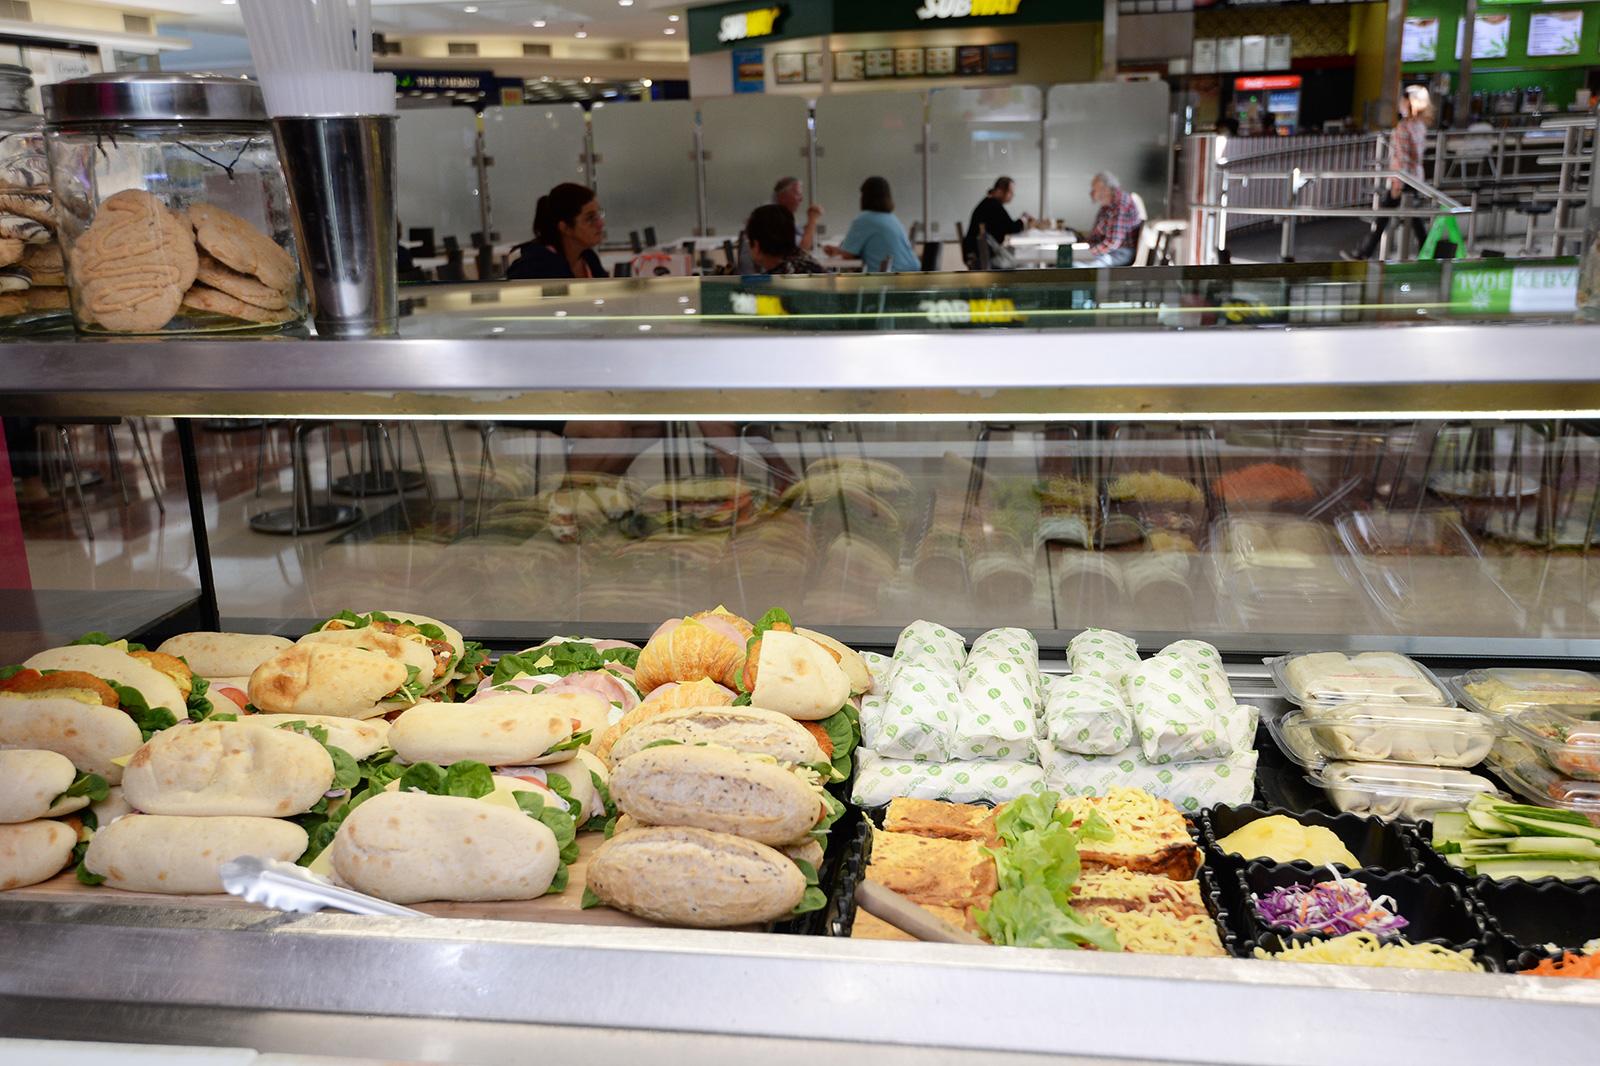 take-a-way-sandwich-shop-healthy-habits-grafton-shopping-world-reduced-price-5